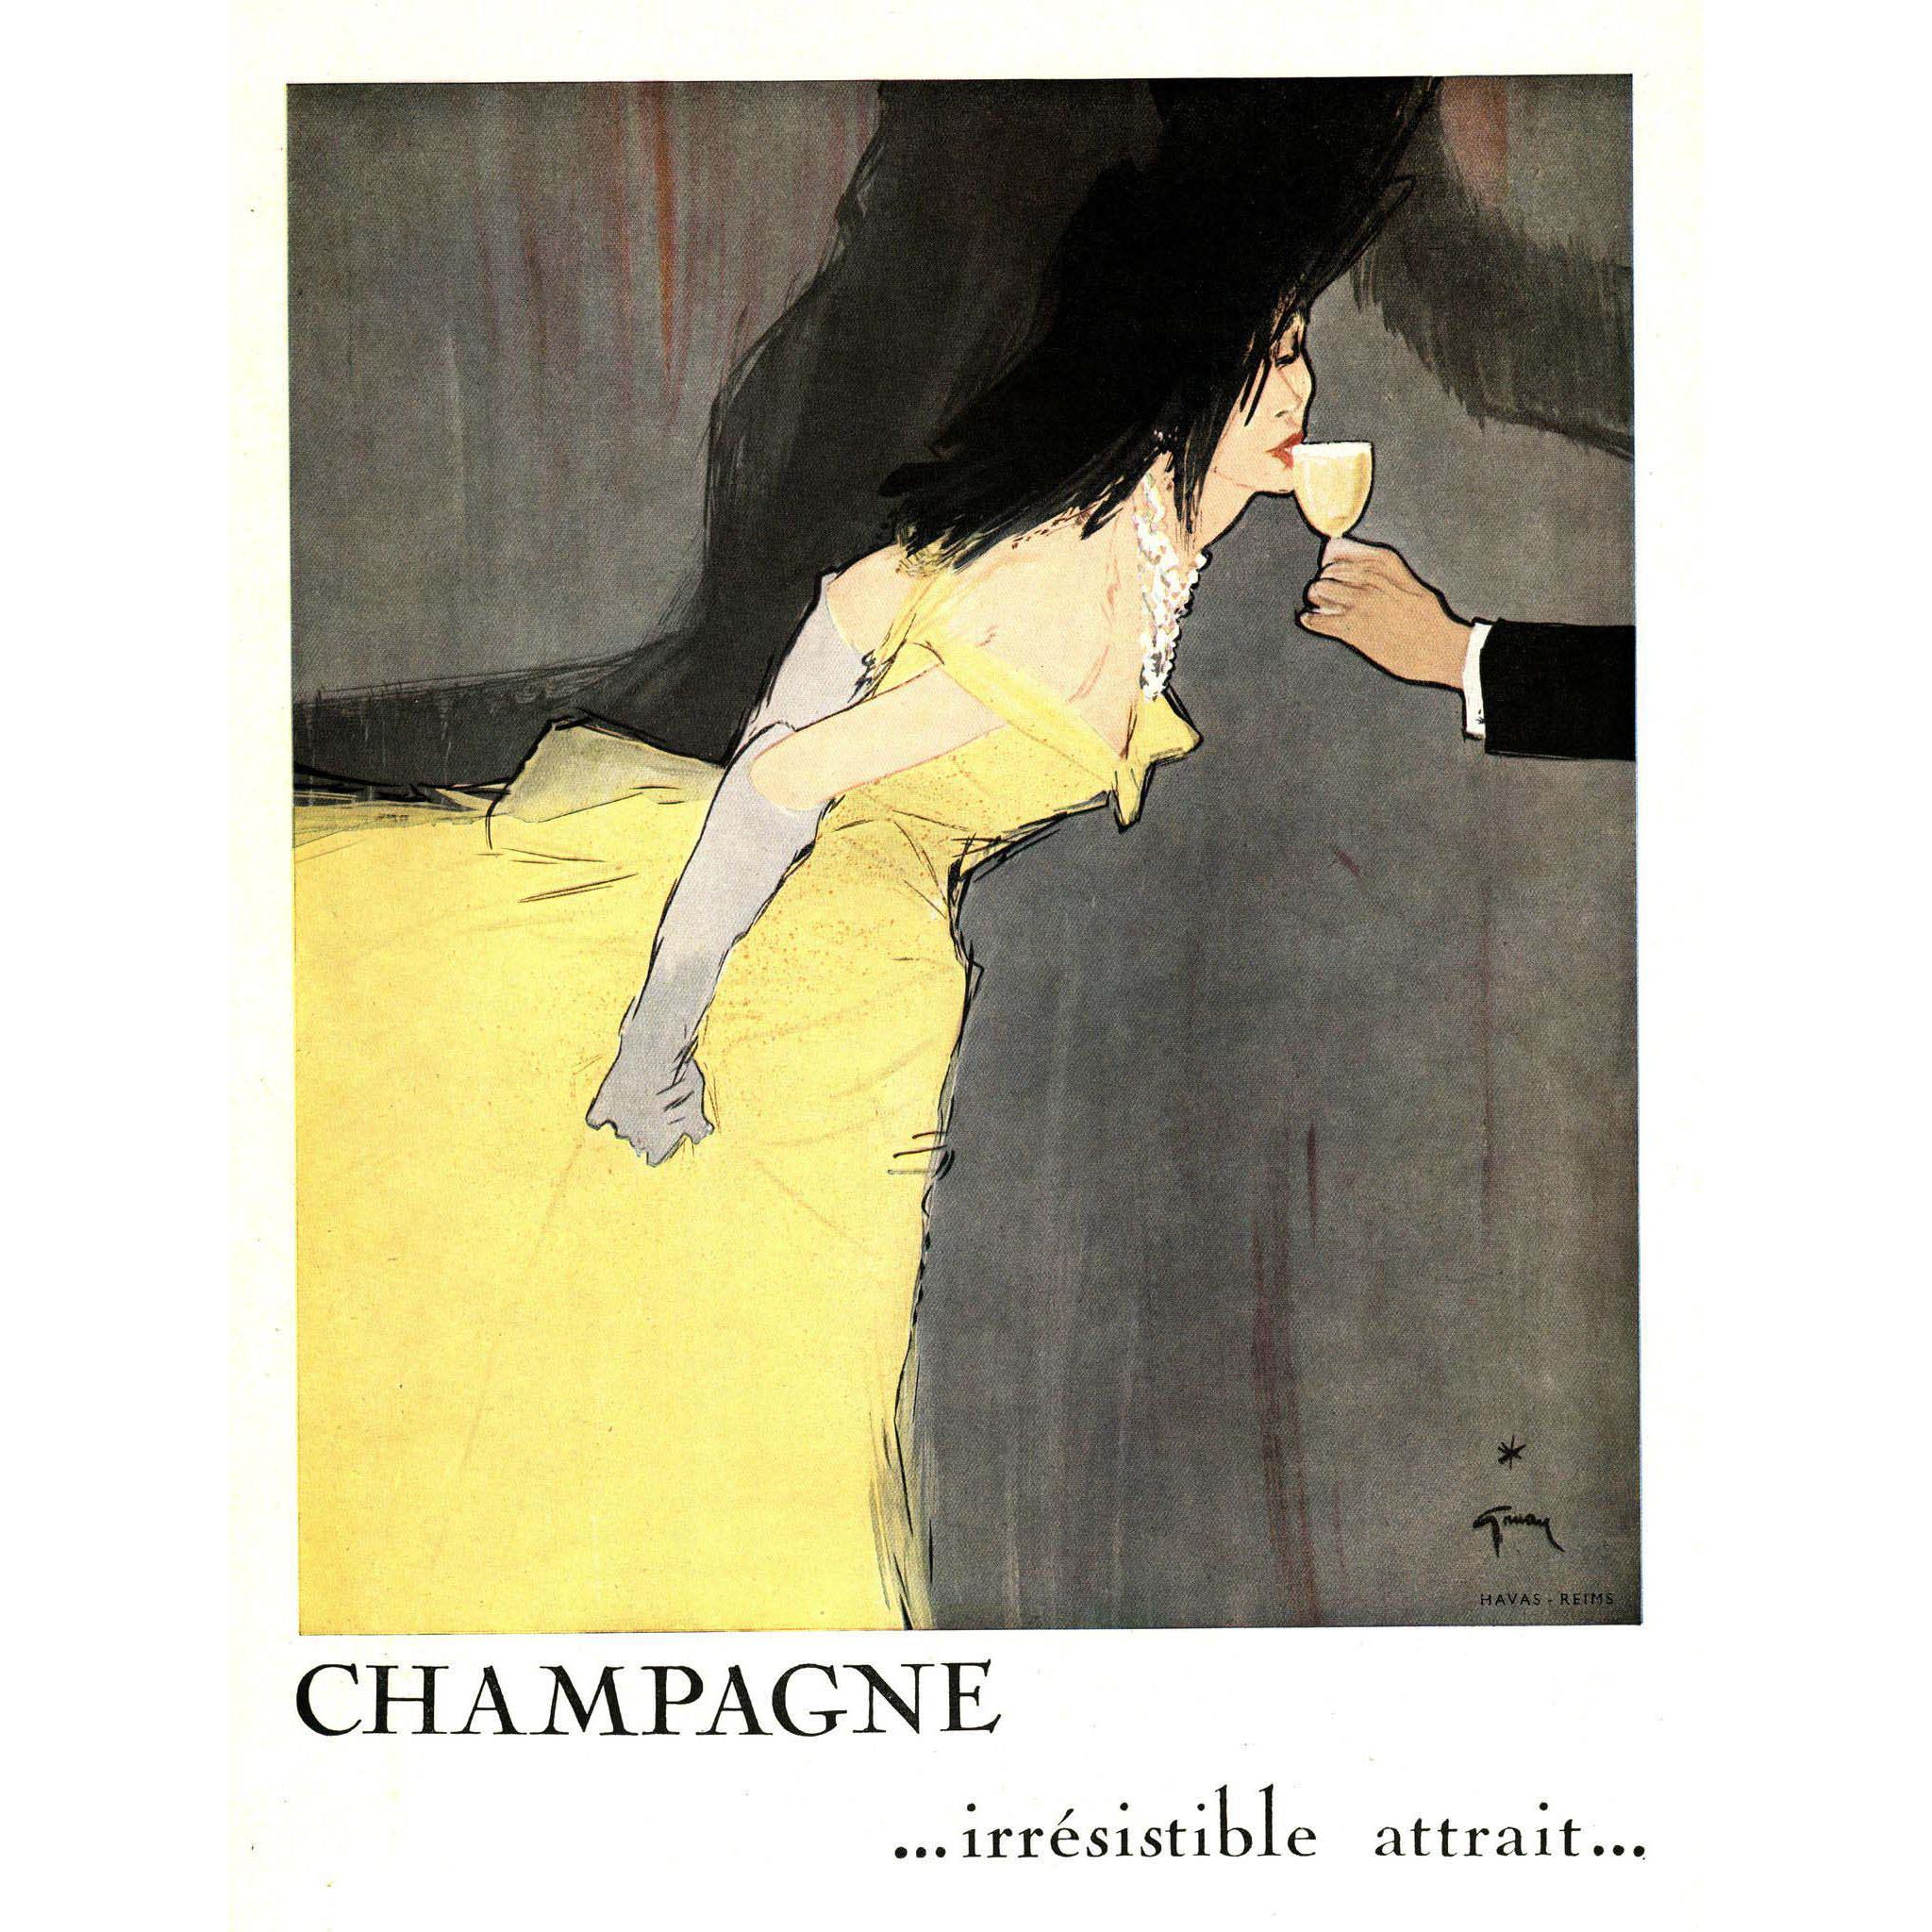 Original Champagne Print by Rene Gruau